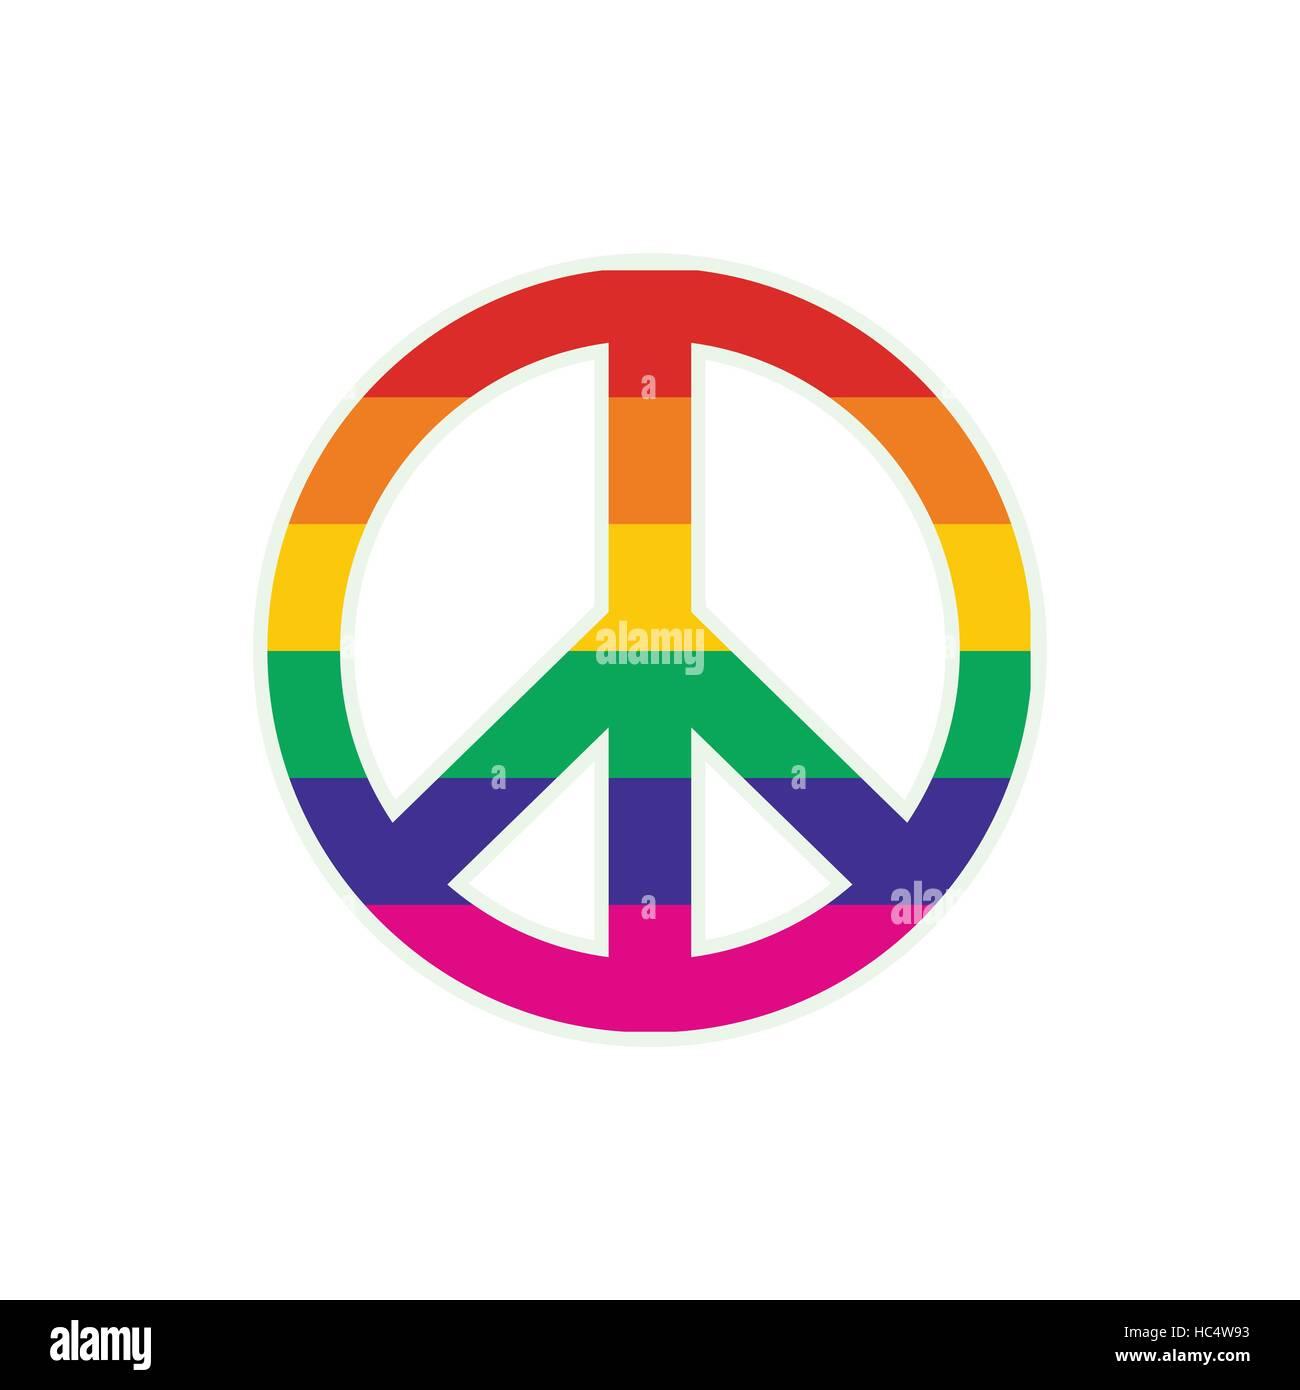 Irish mob symbols choice image symbol and sign ideas peace and serenity symbols choice image symbol and sign ideas peace symbol rainbow flat icon stock biocorpaavc